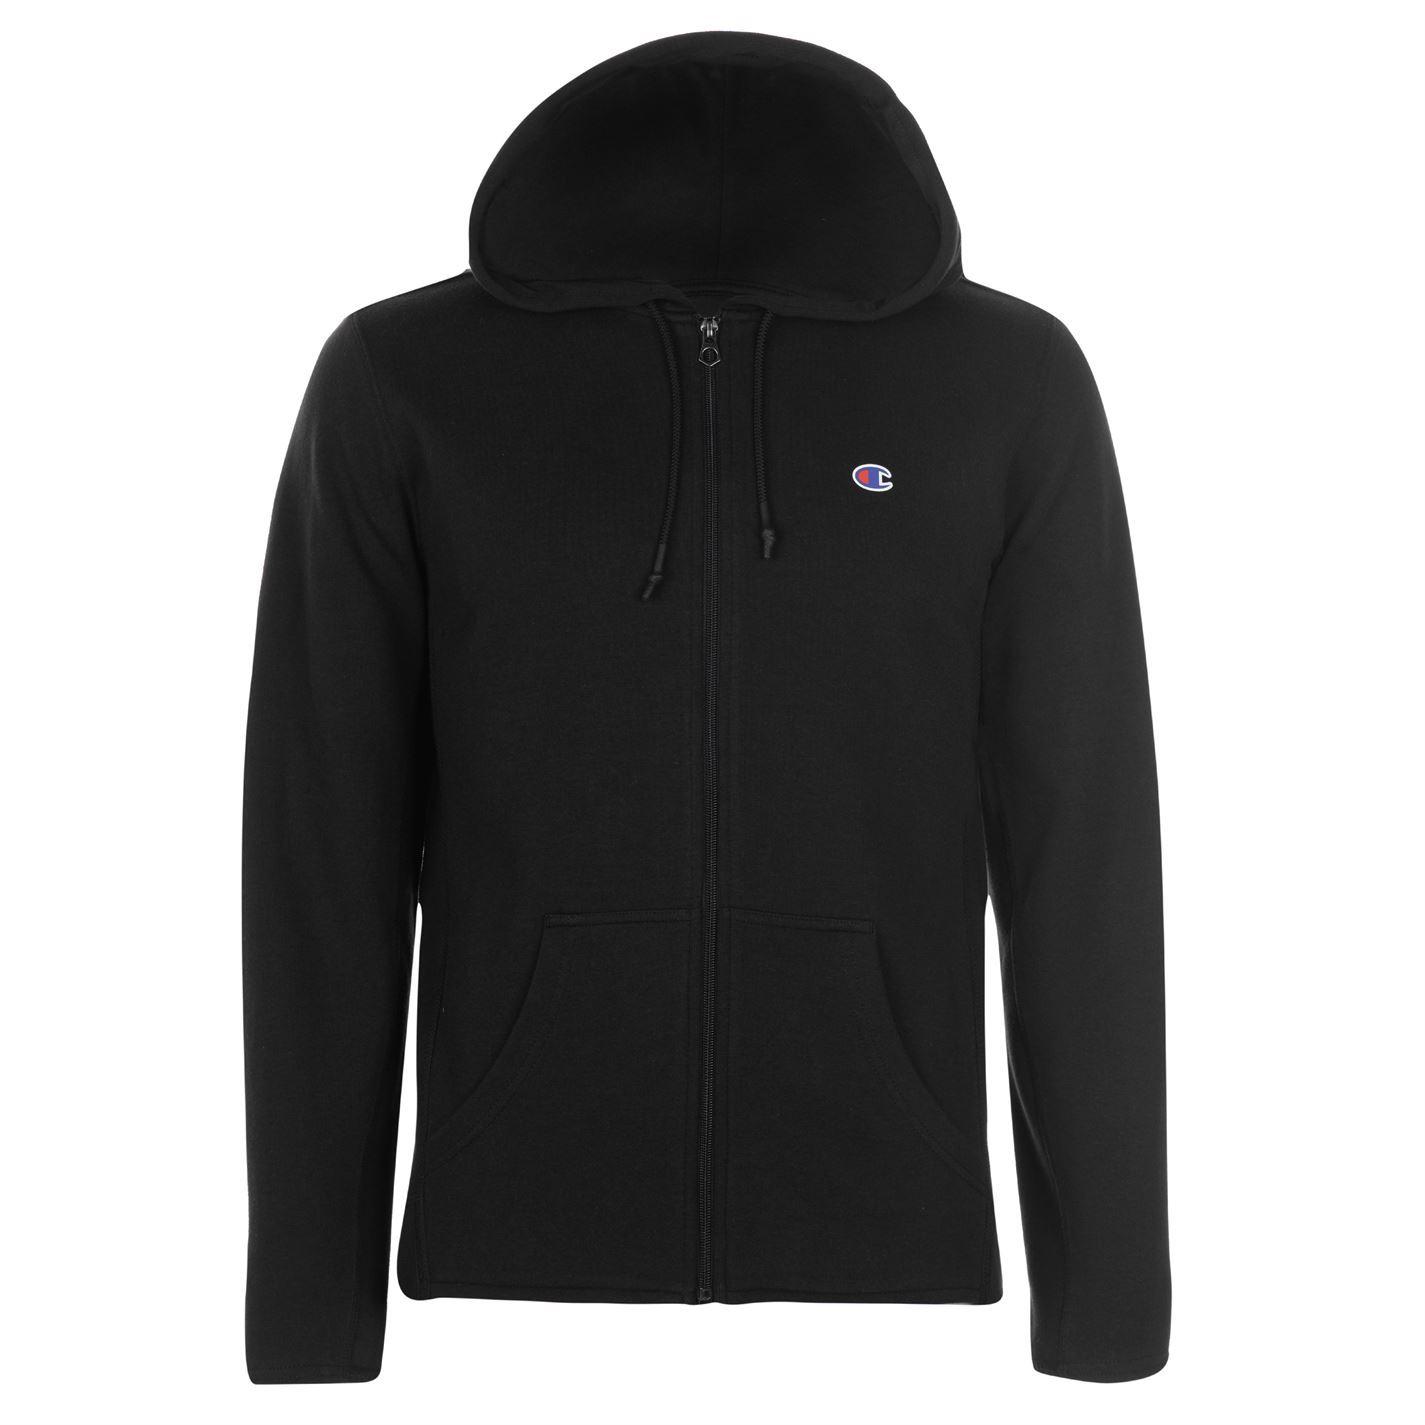 Champion-Interlock-Full-Zip-Hoody-Mens-Hoodie-Top-Sweatshirt-Sweater thumbnail 7